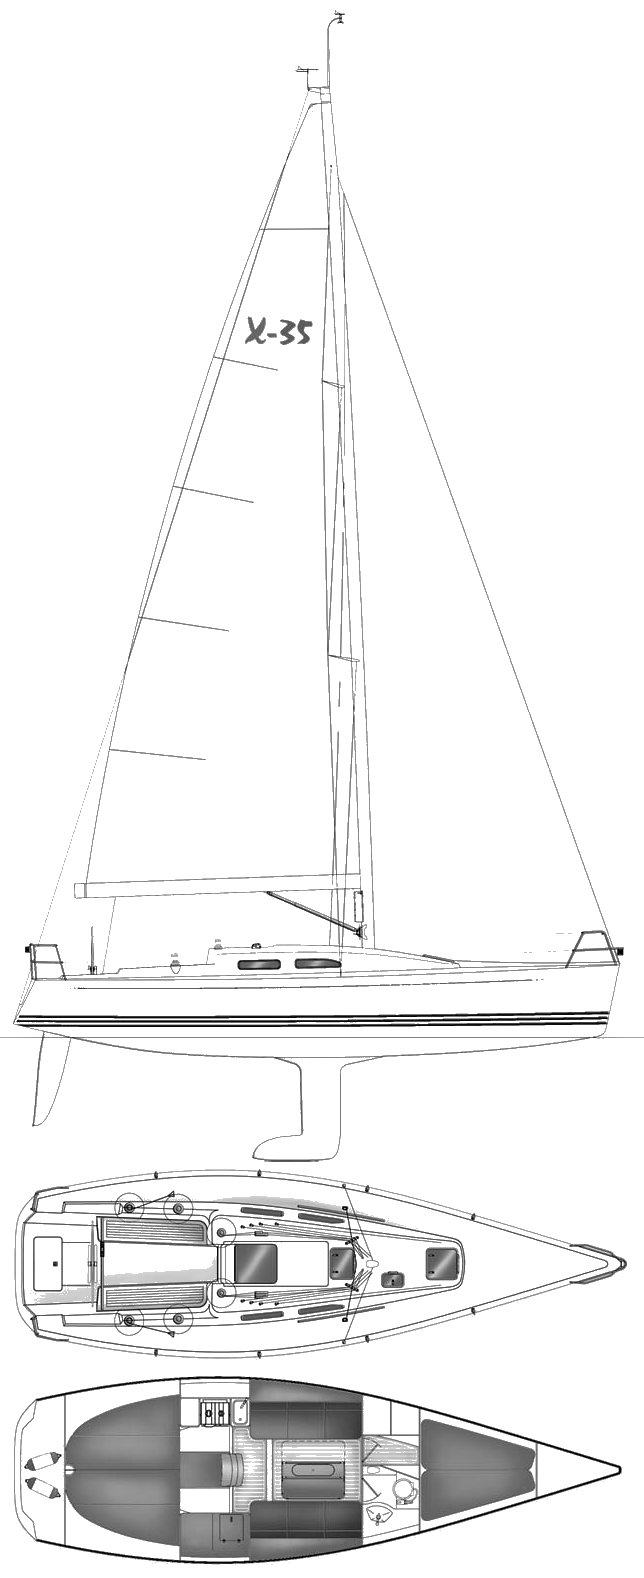 X-35 drawing